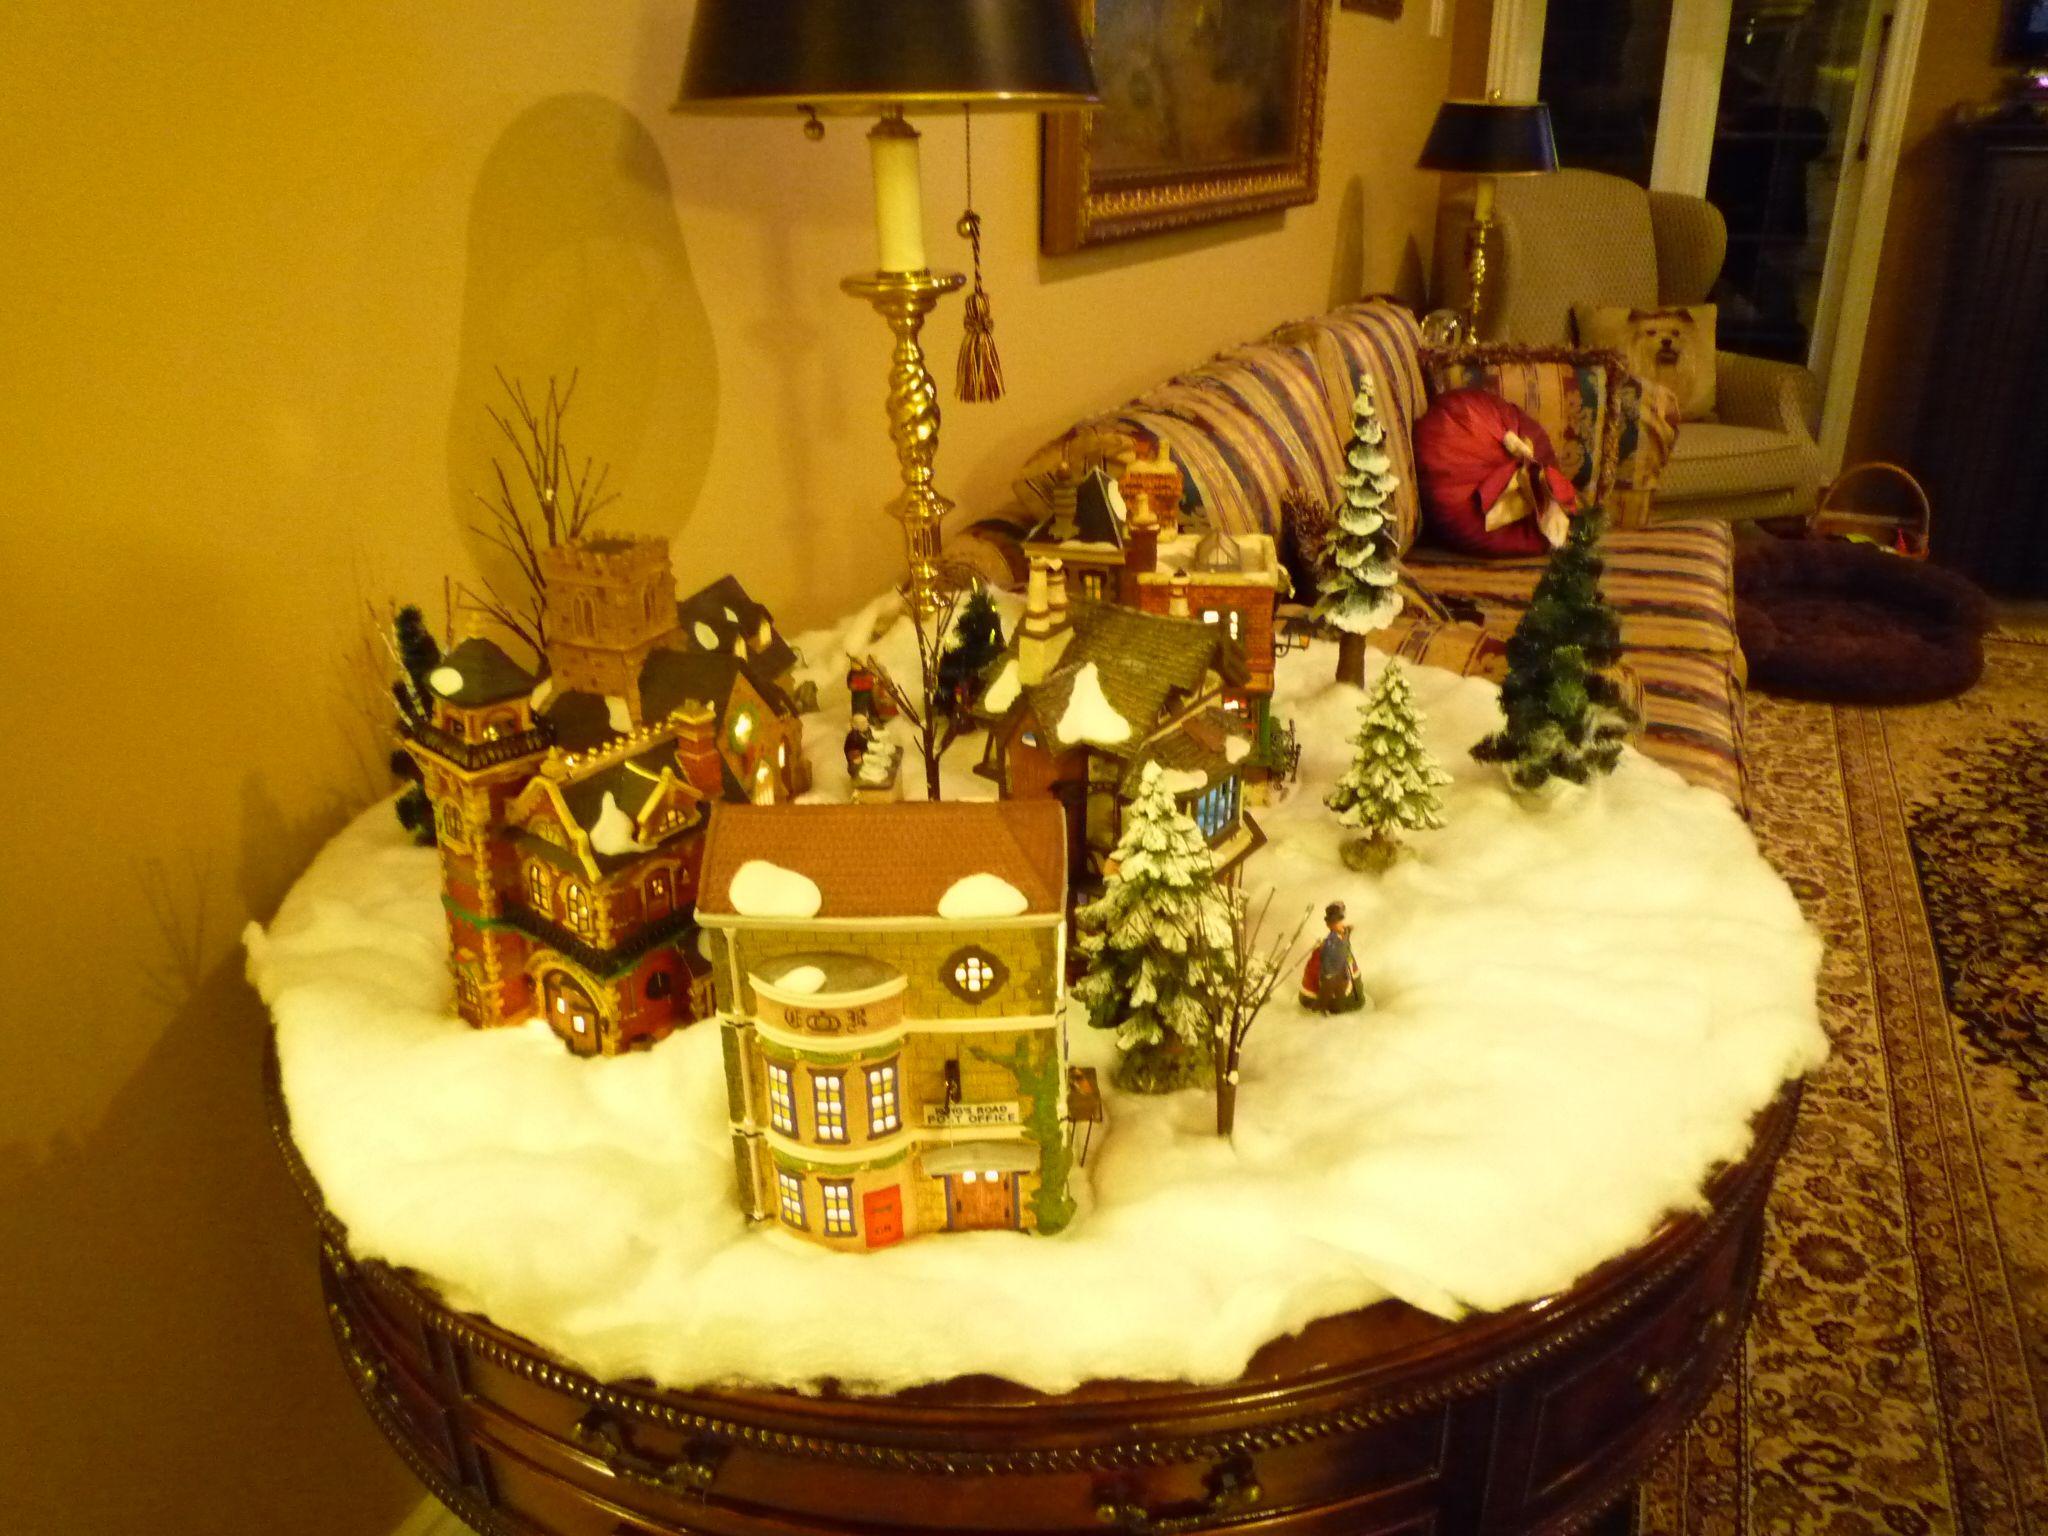 Dept 56 Christmas home, Dept 56, Christmas